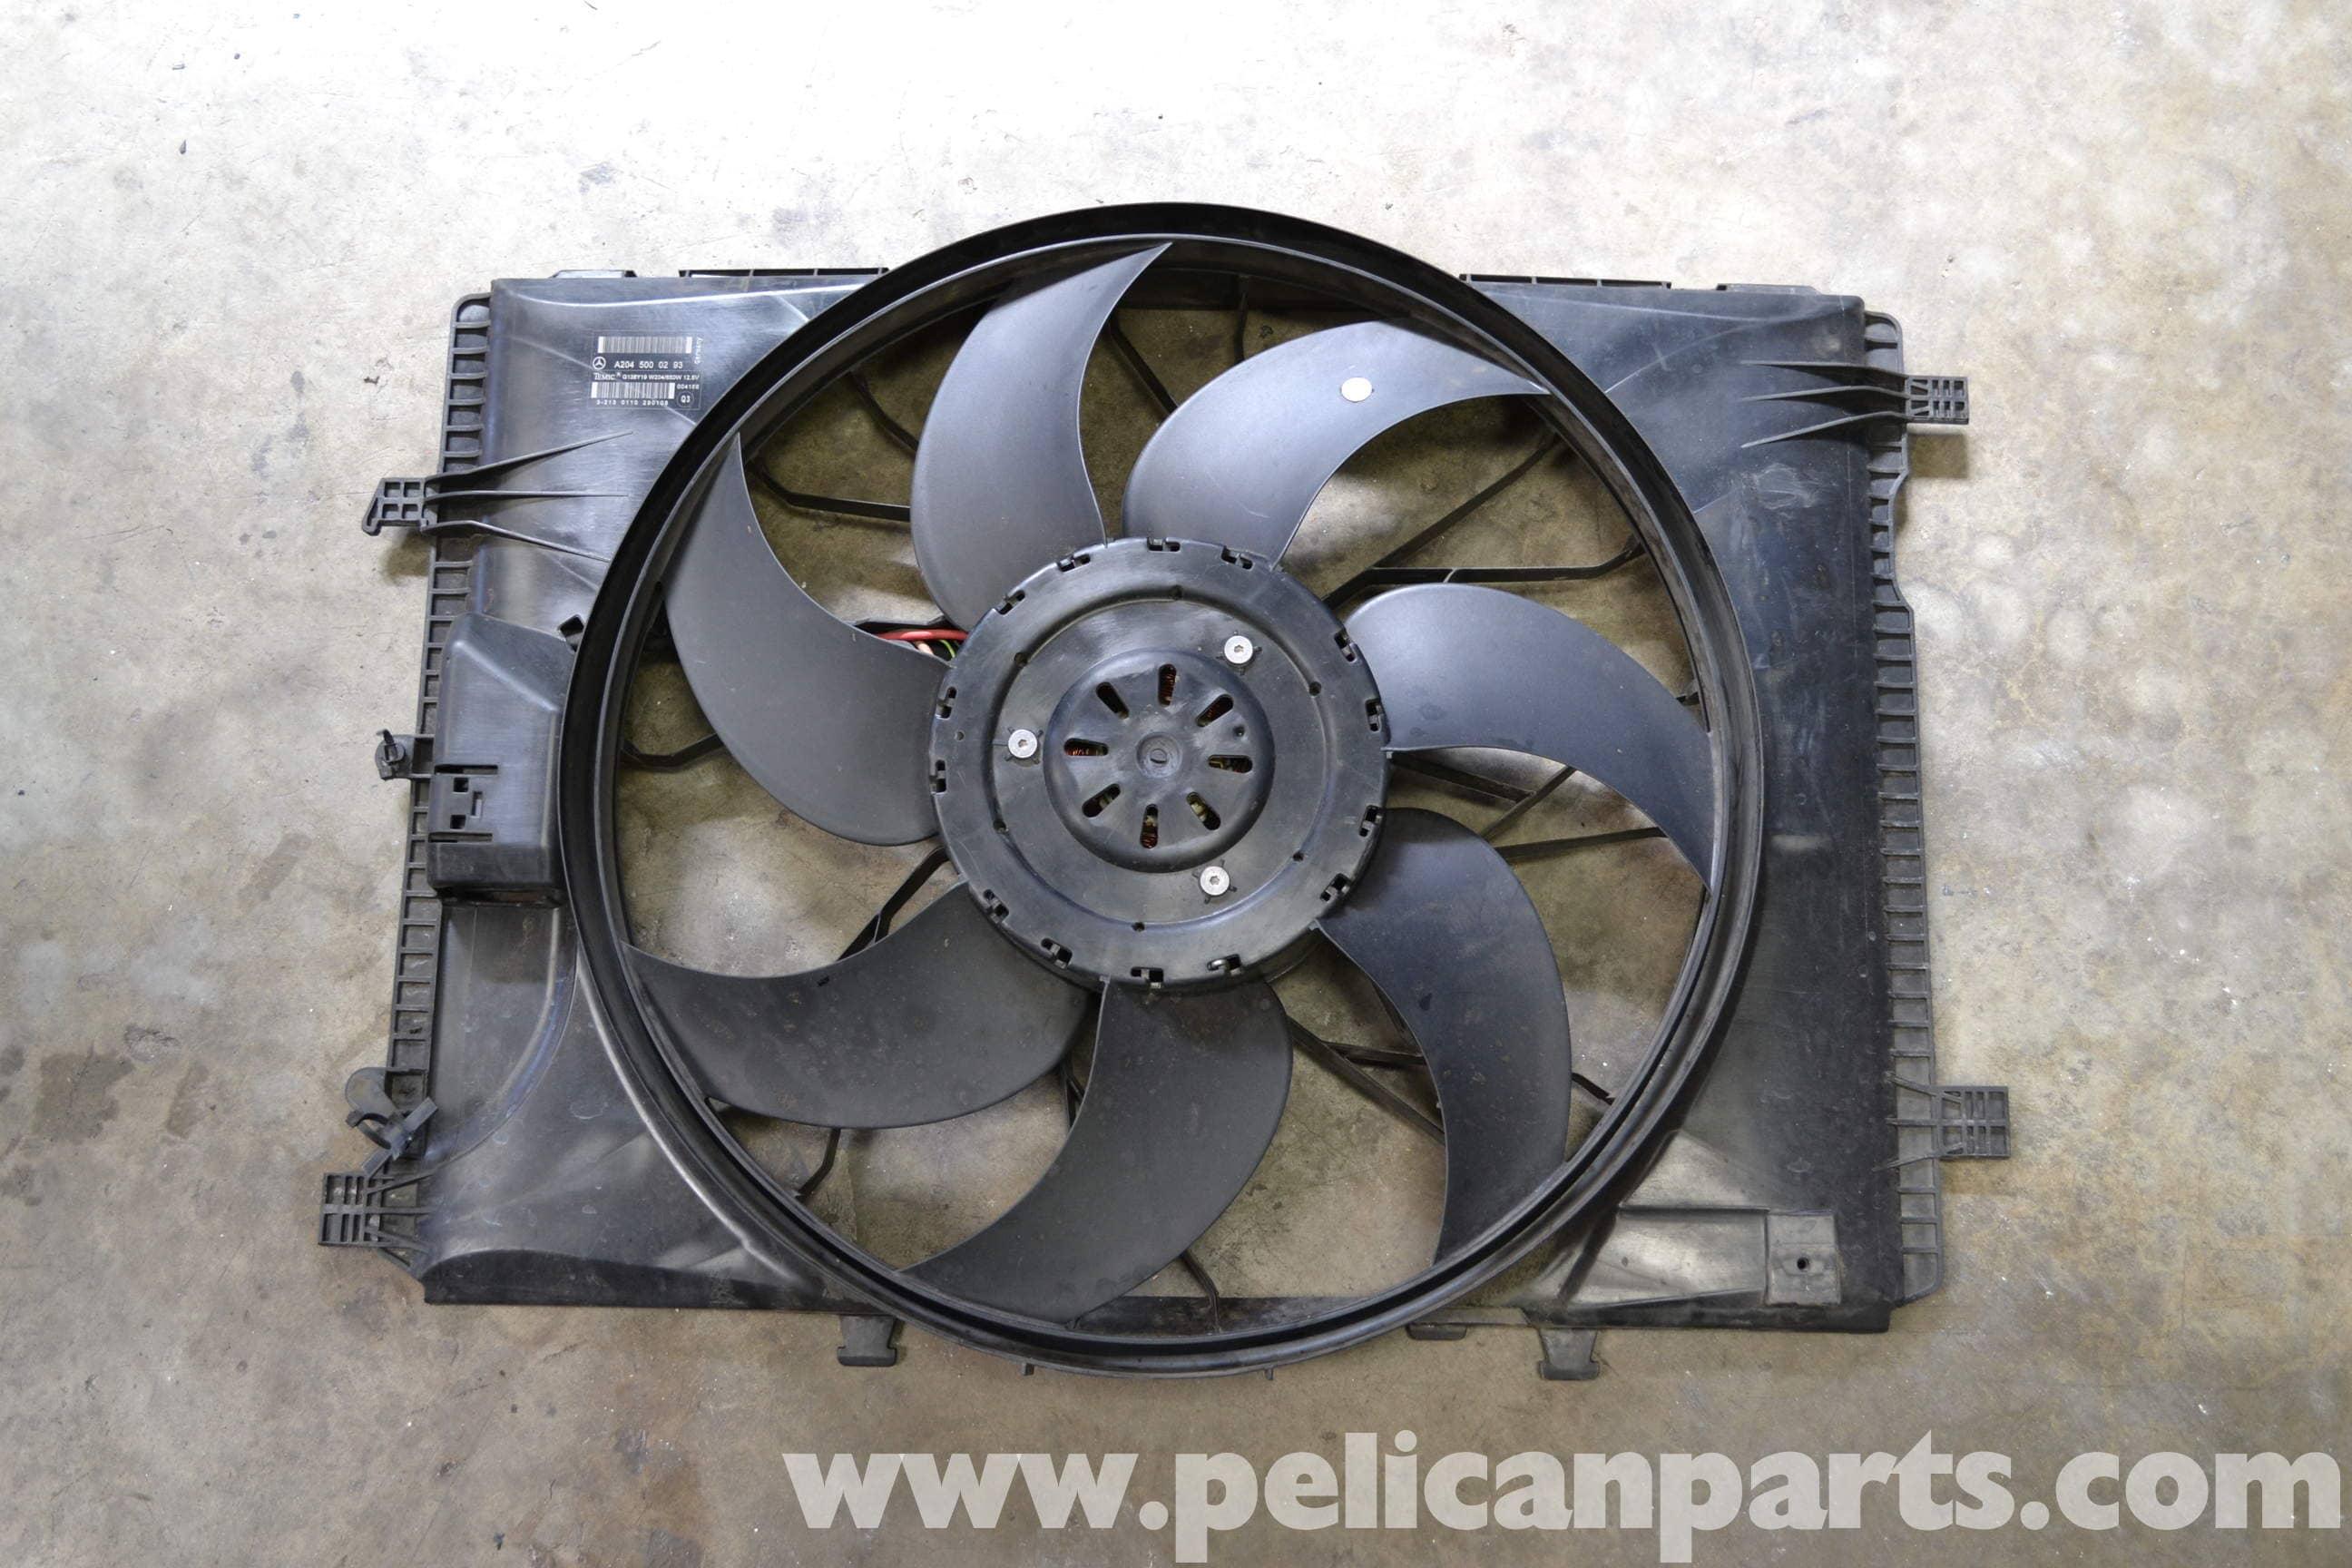 Mercedes-Benz W204 Radiator Fan Replacement - (2008-2014) C250, C300